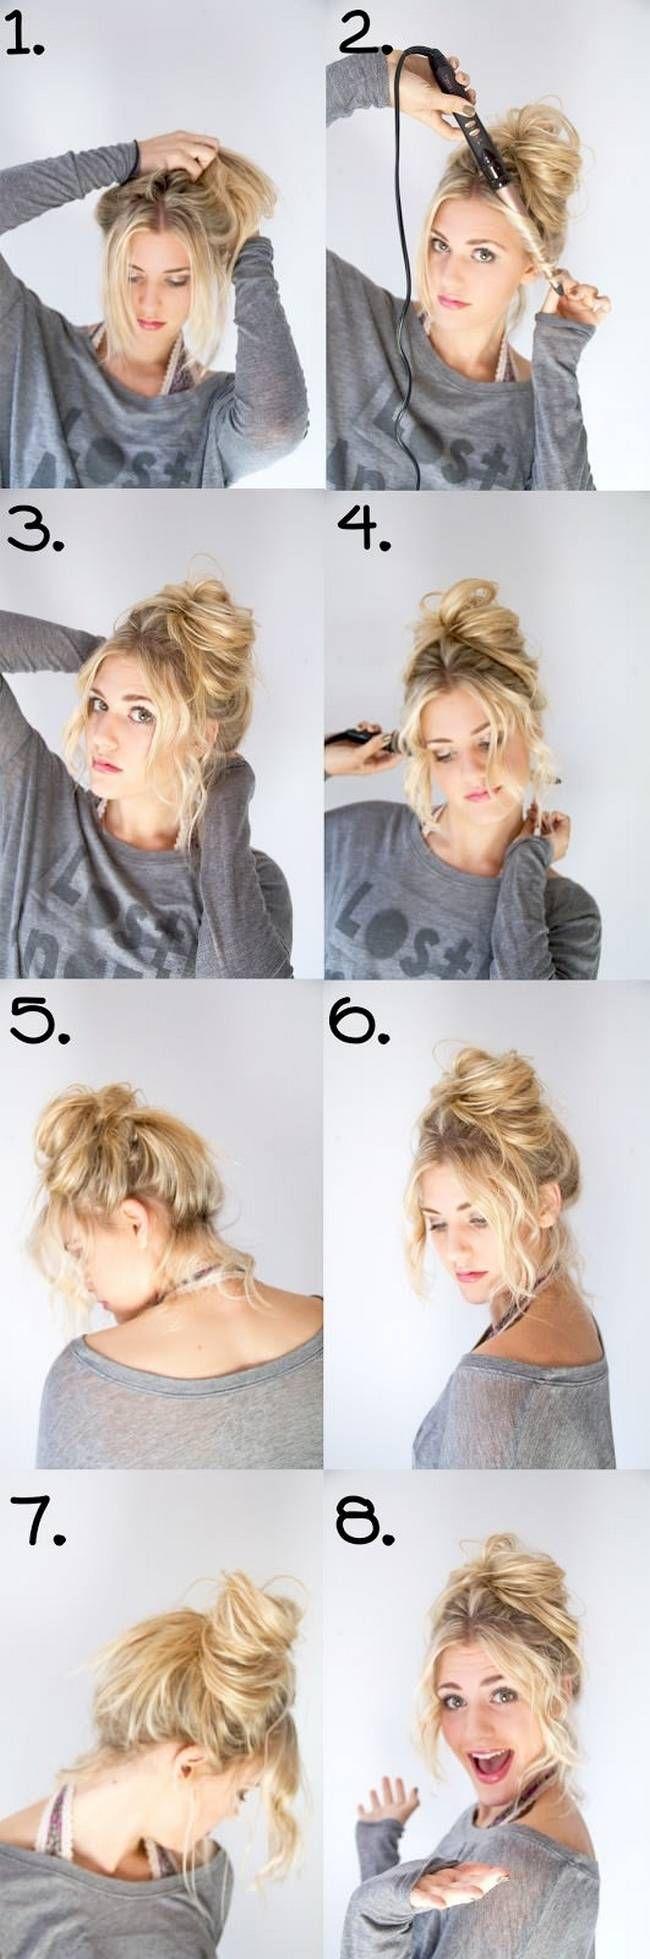 messy bun step by step instructions | 20 amazing step by step bun